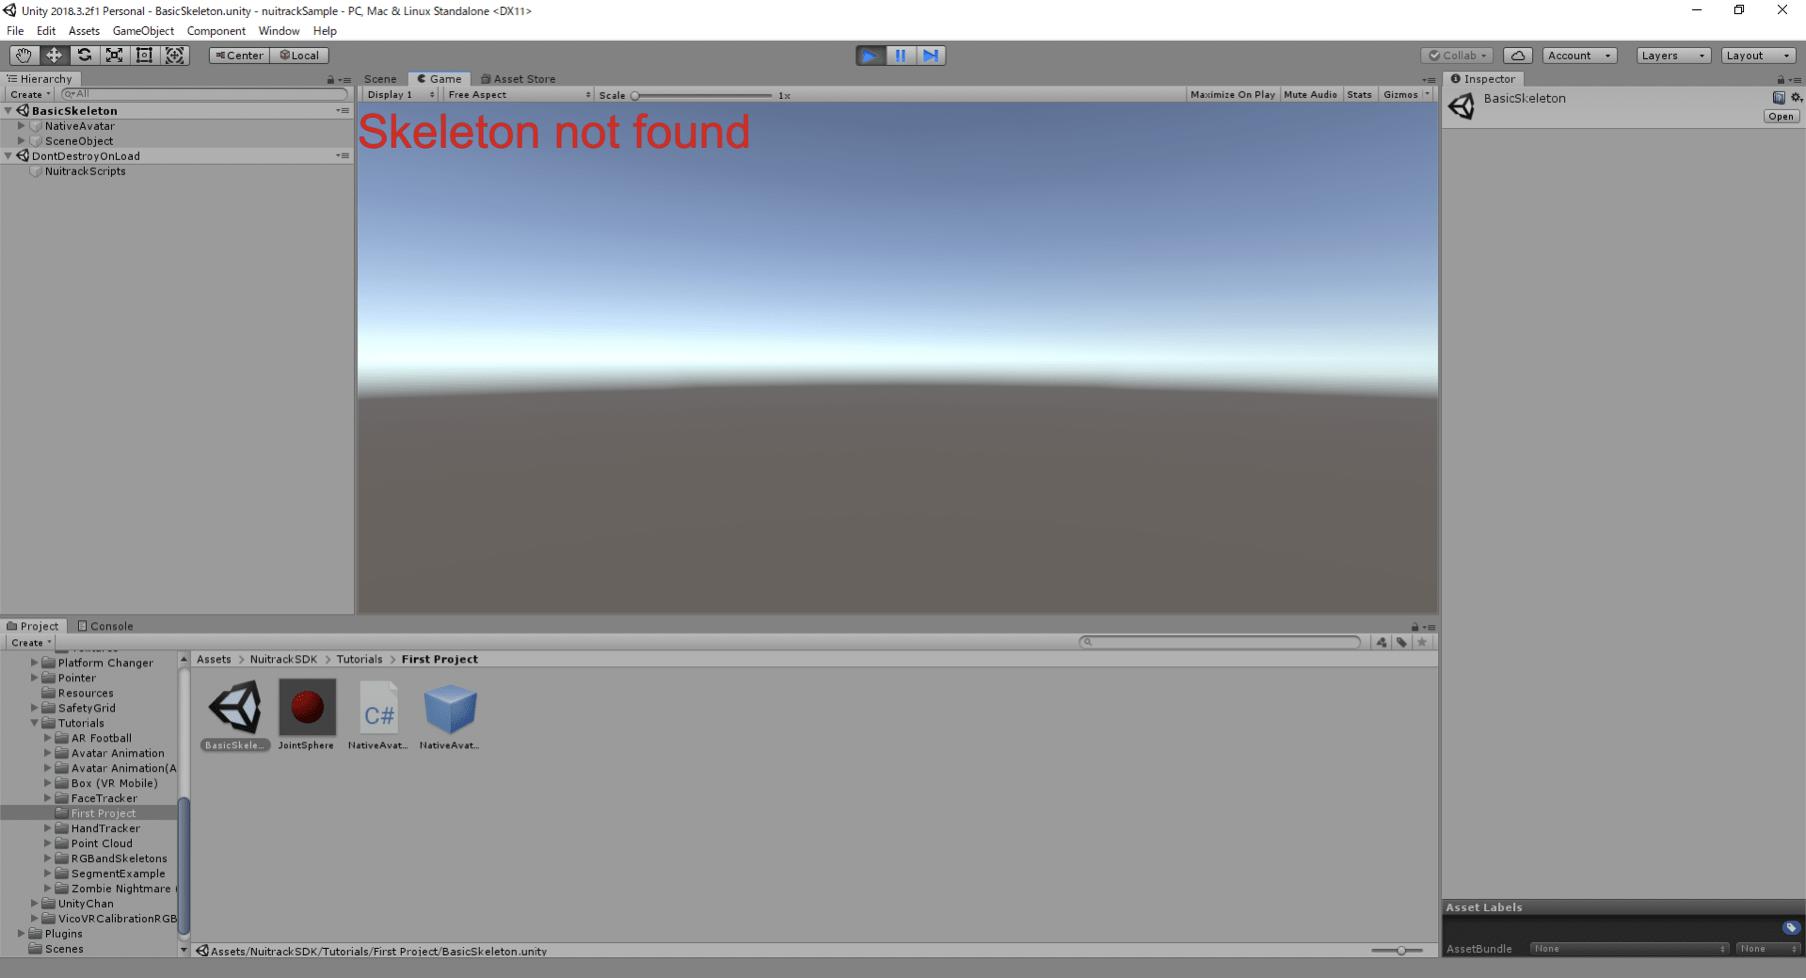 Gameビュー左上に「Skeleton not found」と赤い文字が表示される